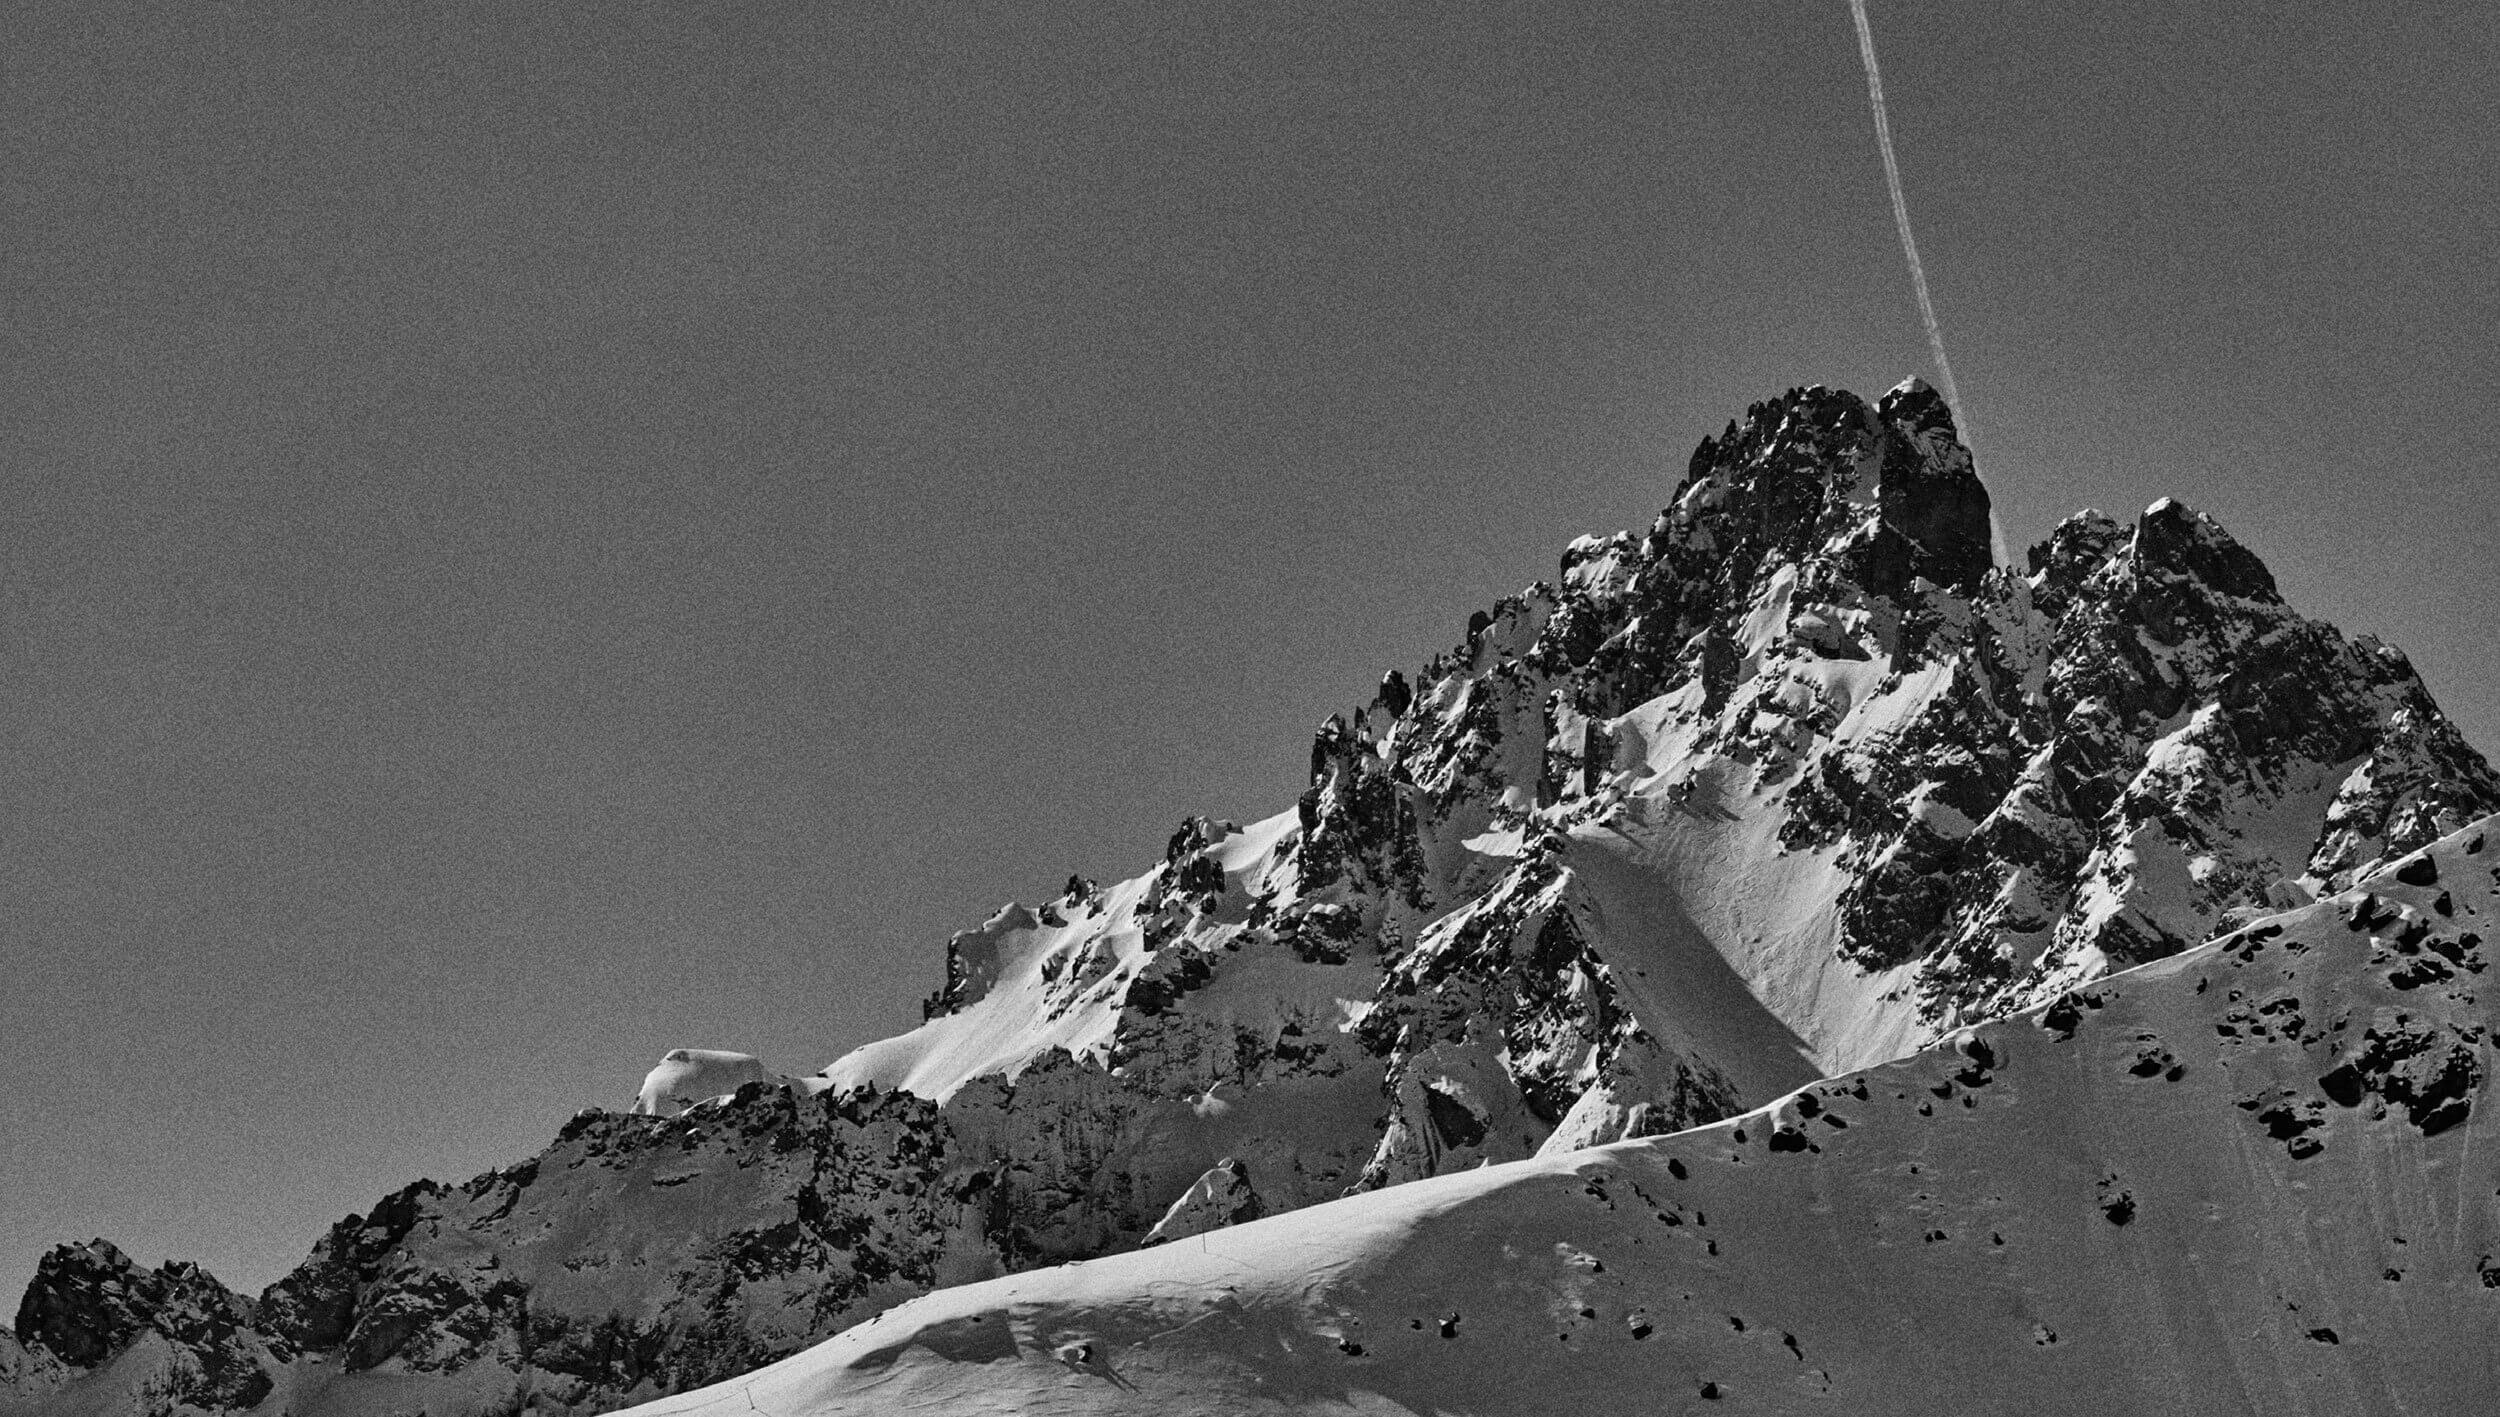 A photograph of an alpine mountain peak